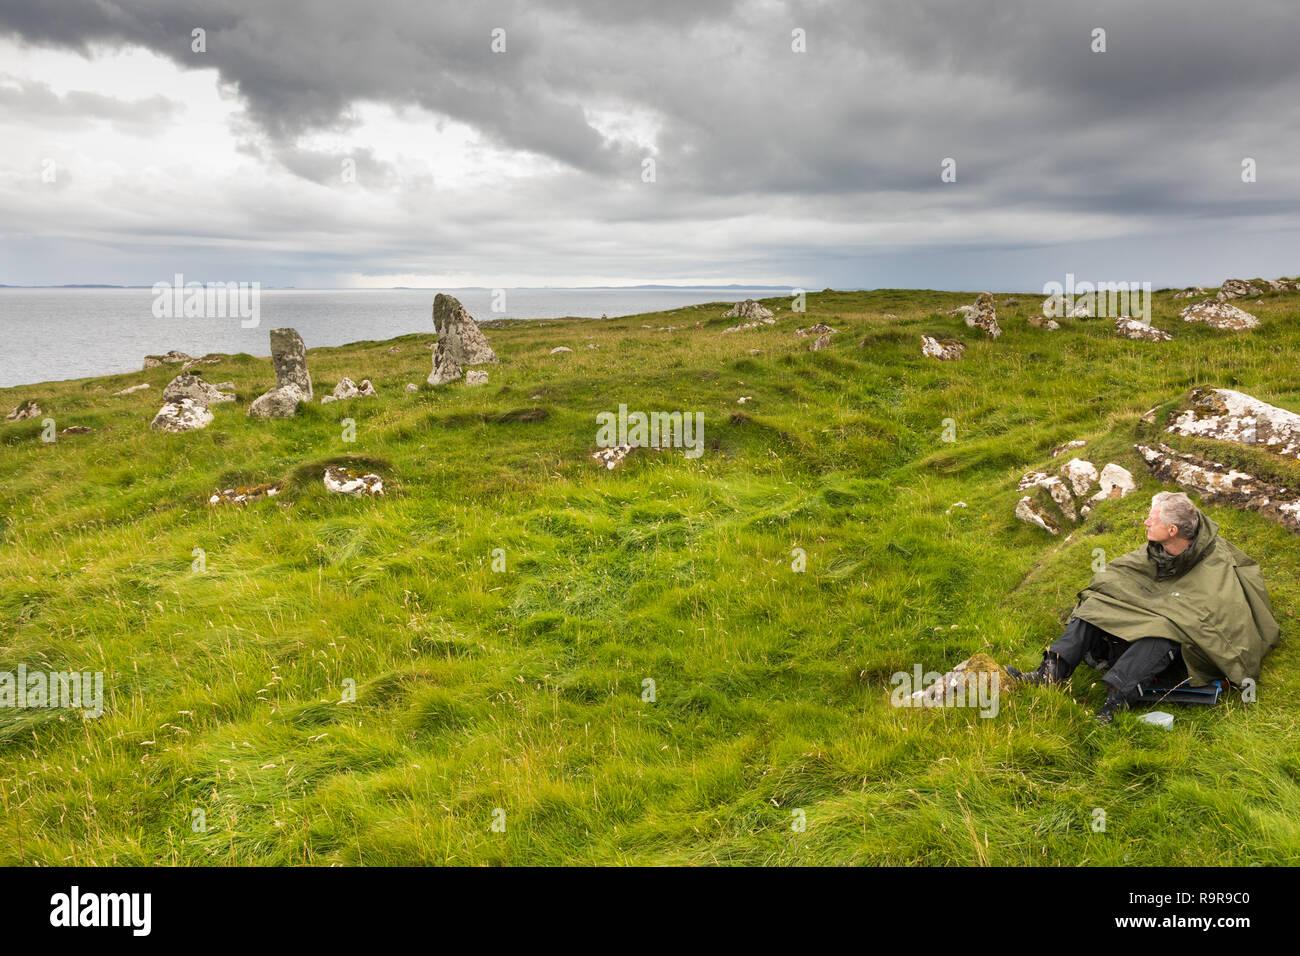 Person seeking protection against the rain, sitting on the grass. Fetlar, Shetland Islands. Stock Photo